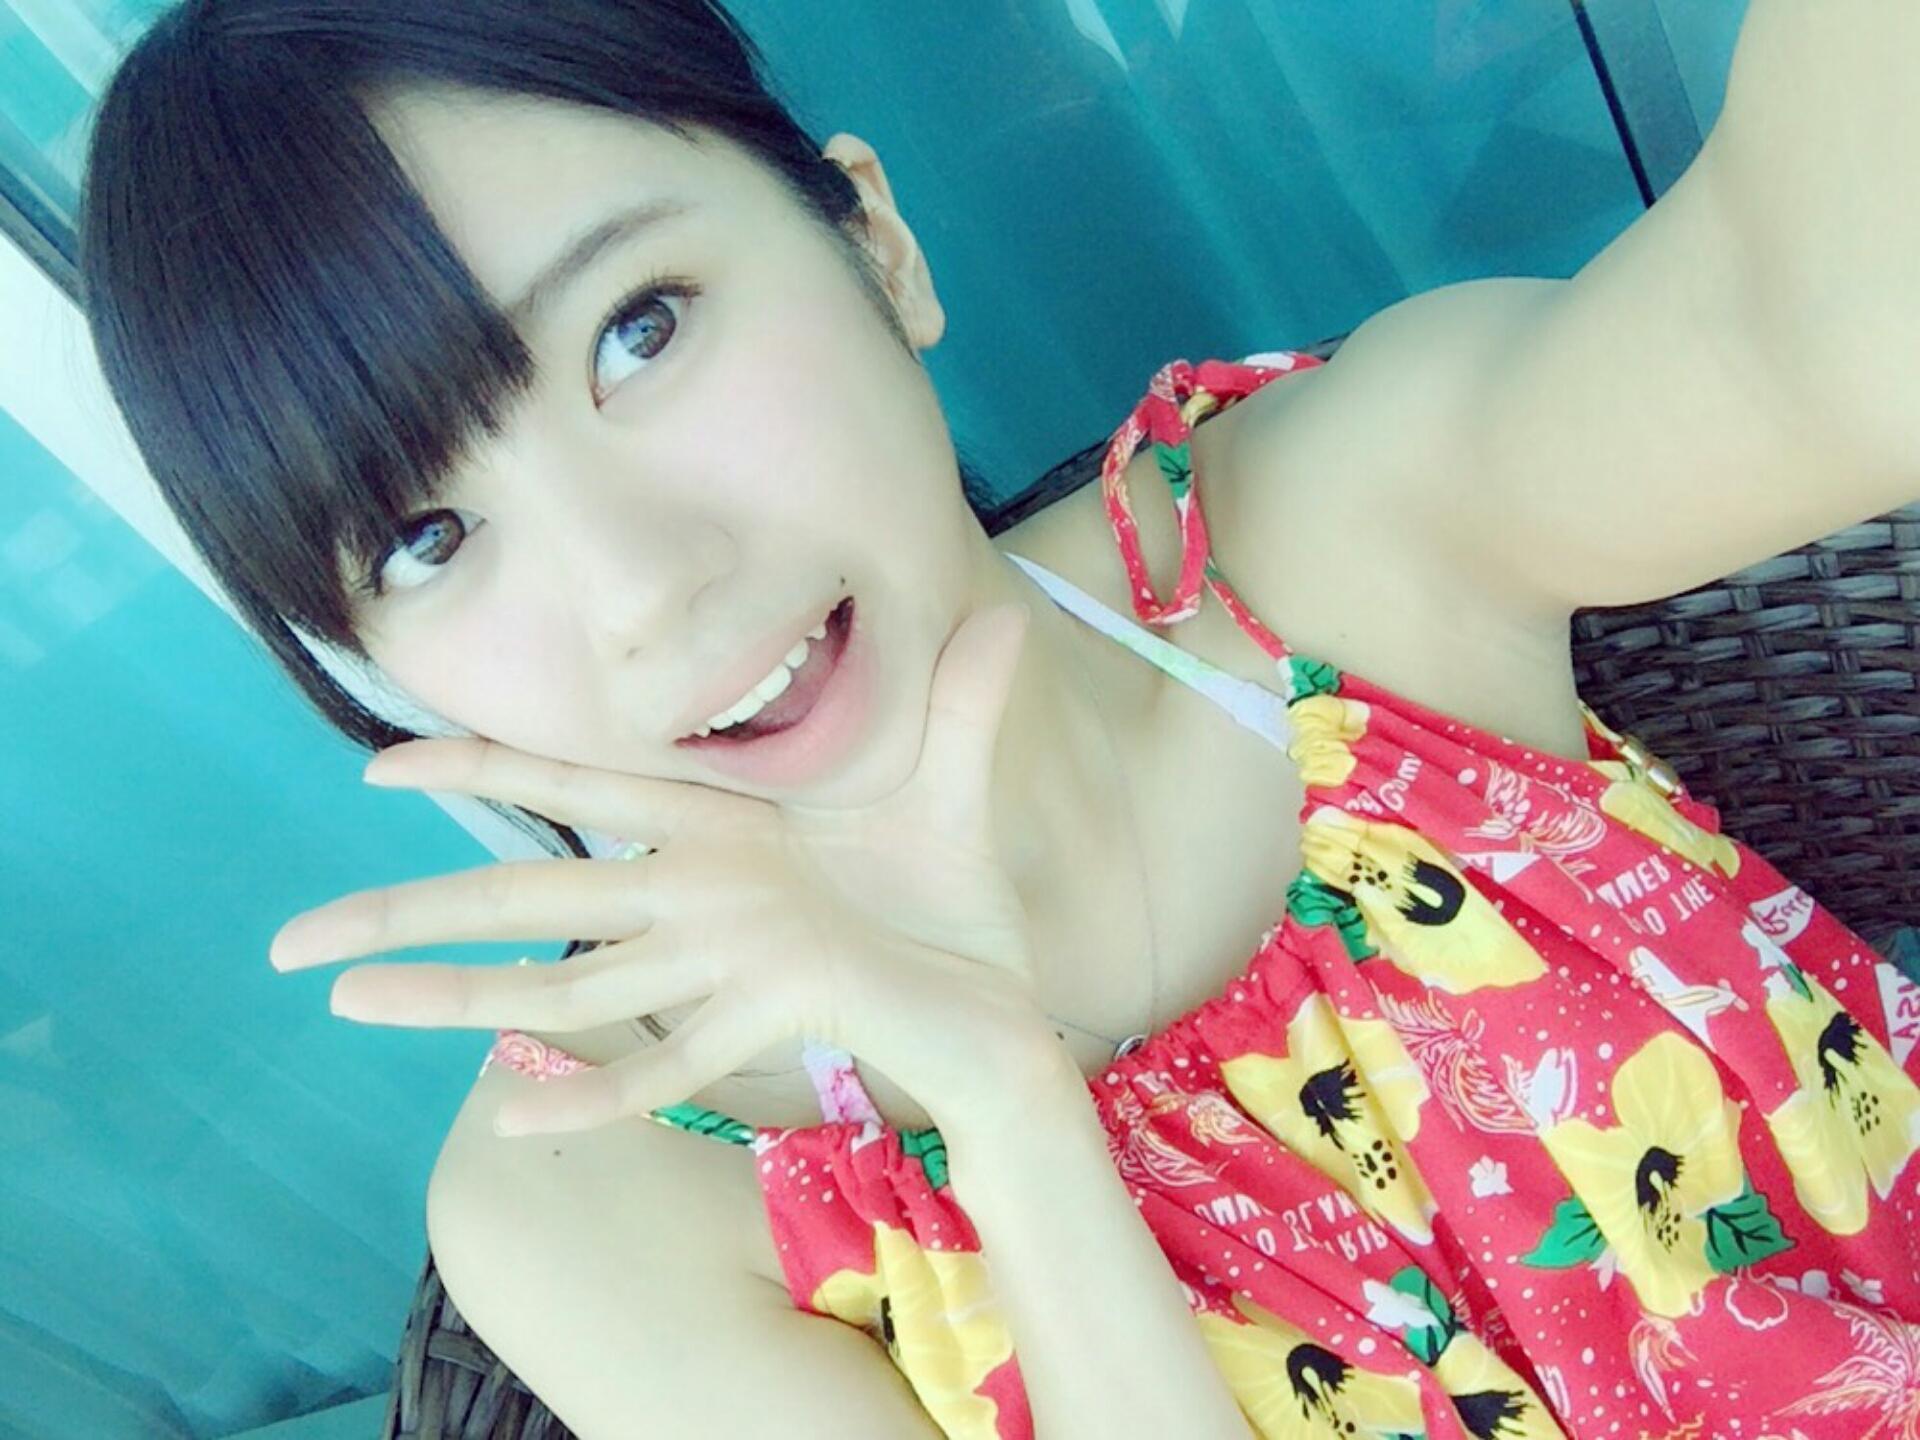 【AKB48】大西桃香応援スレ★11【チーム8奈良】©2ch.netYouTube動画>60本 ->画像>185枚